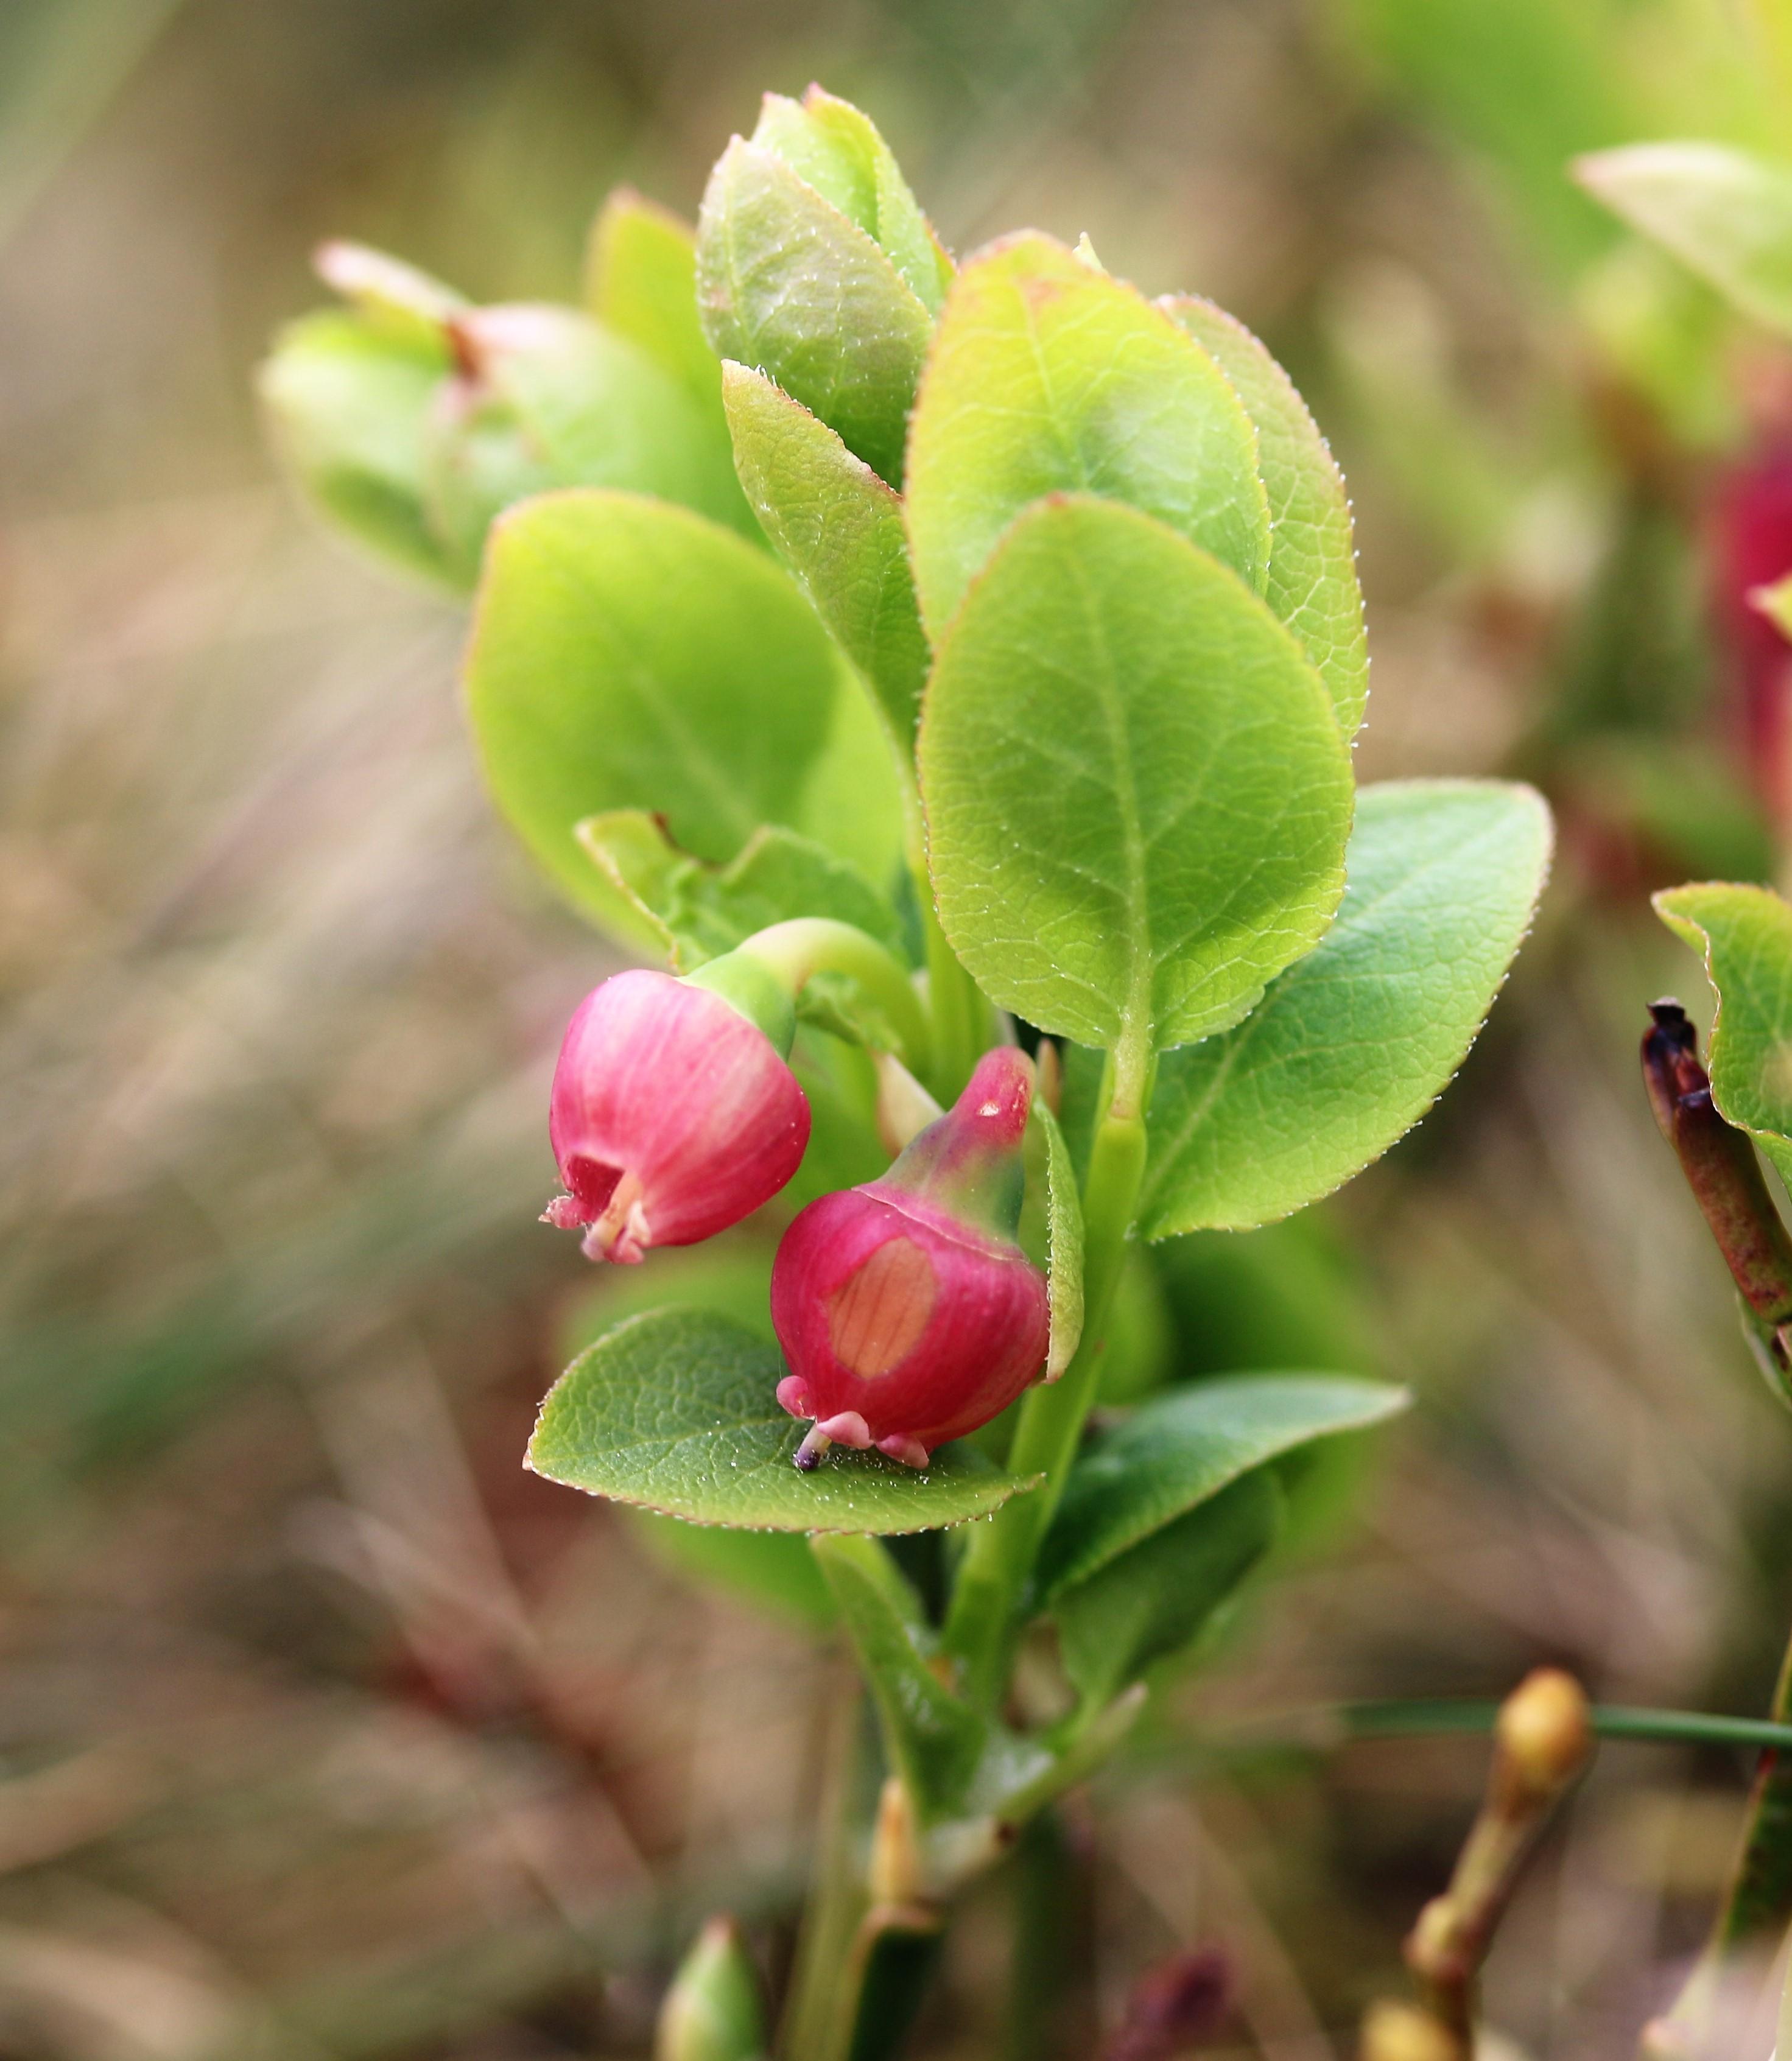 Vaccinium myrtillus. Bilberry.